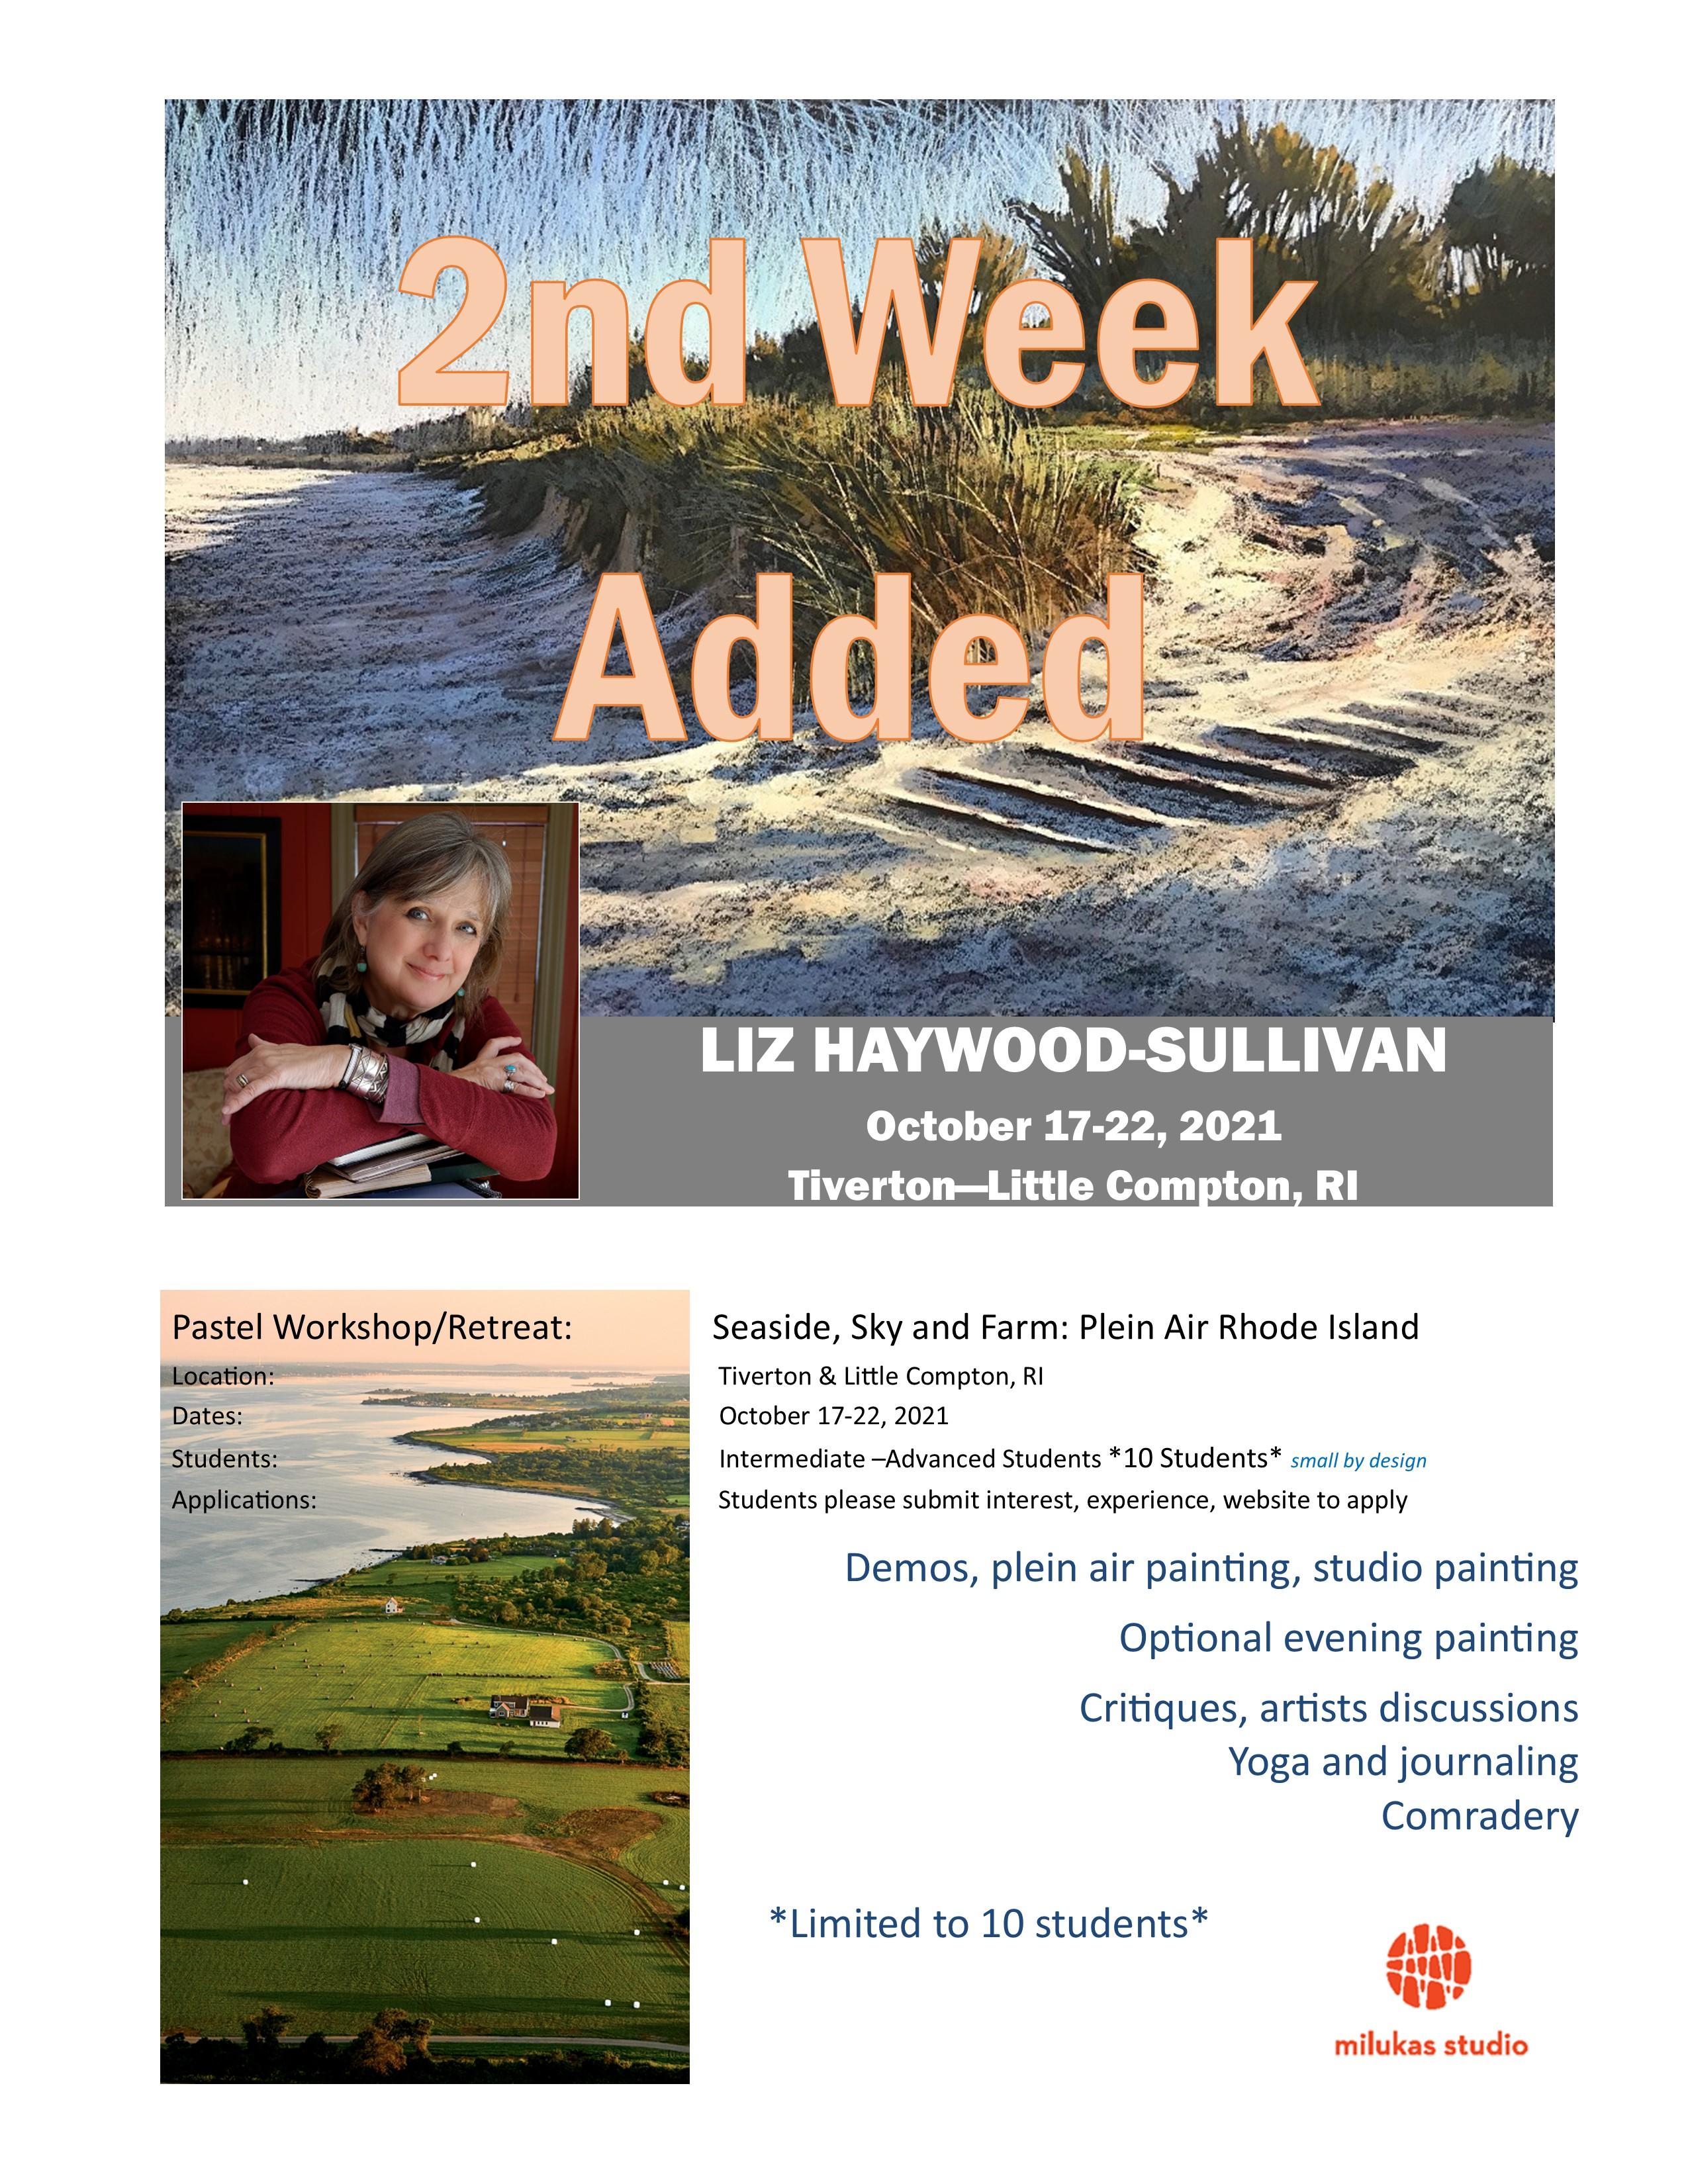 Liz Haywood-Sullivan 2nd Week Added October 17-22 2021